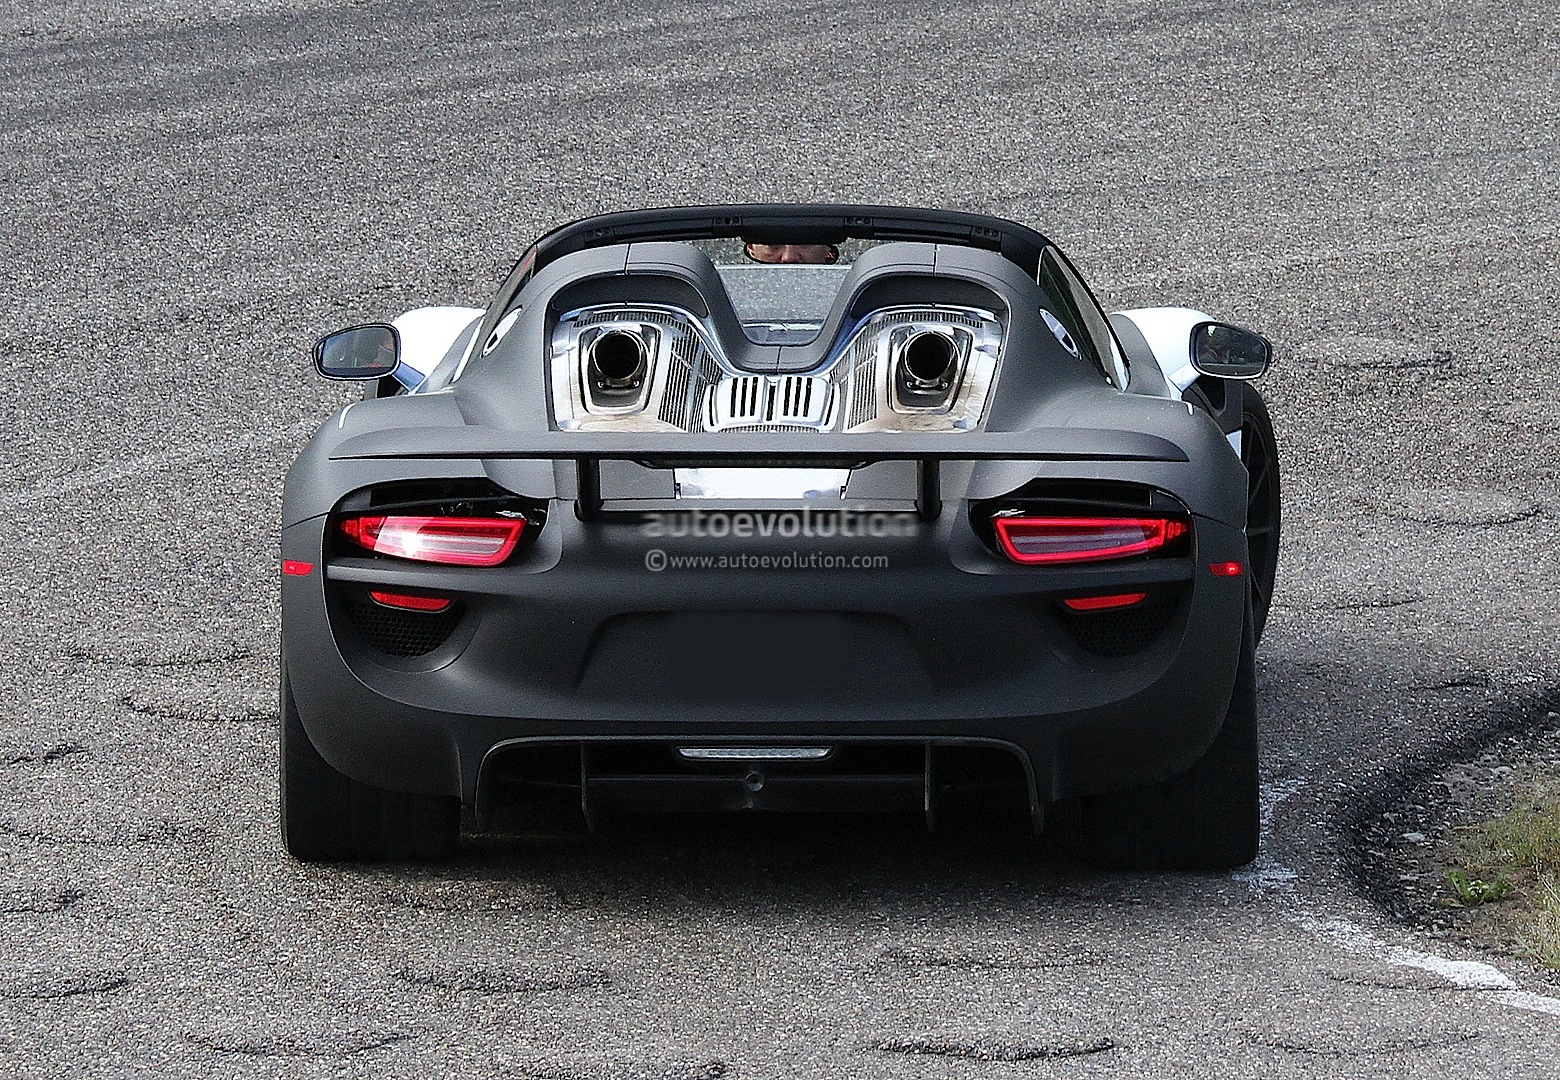 2014 Toyota Supra Concept Release Date 2014 Porsche 911 Gt3 2014 ...